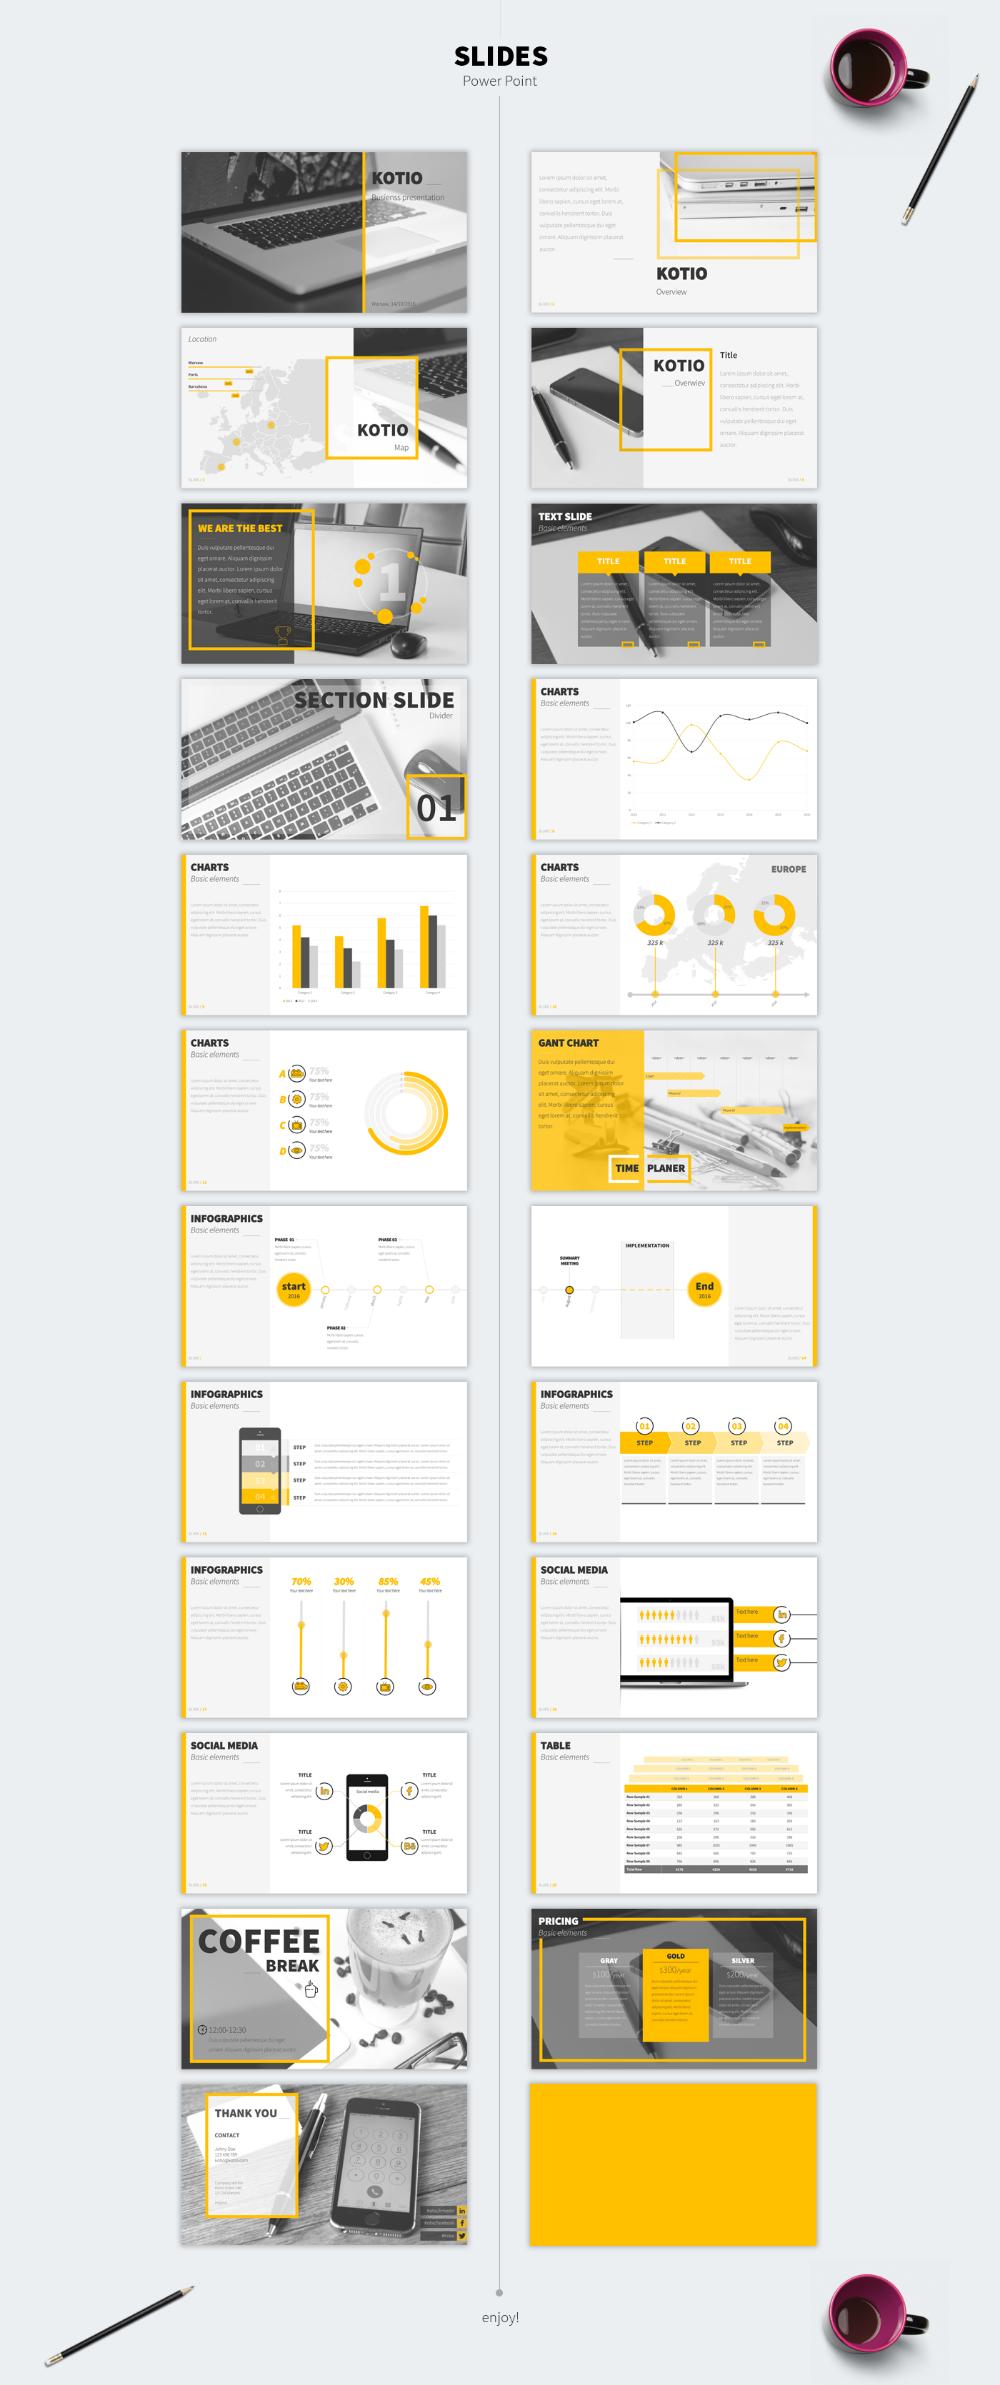 Kotio free Power Point Business Presentation (23 slides) - Just Free Slides